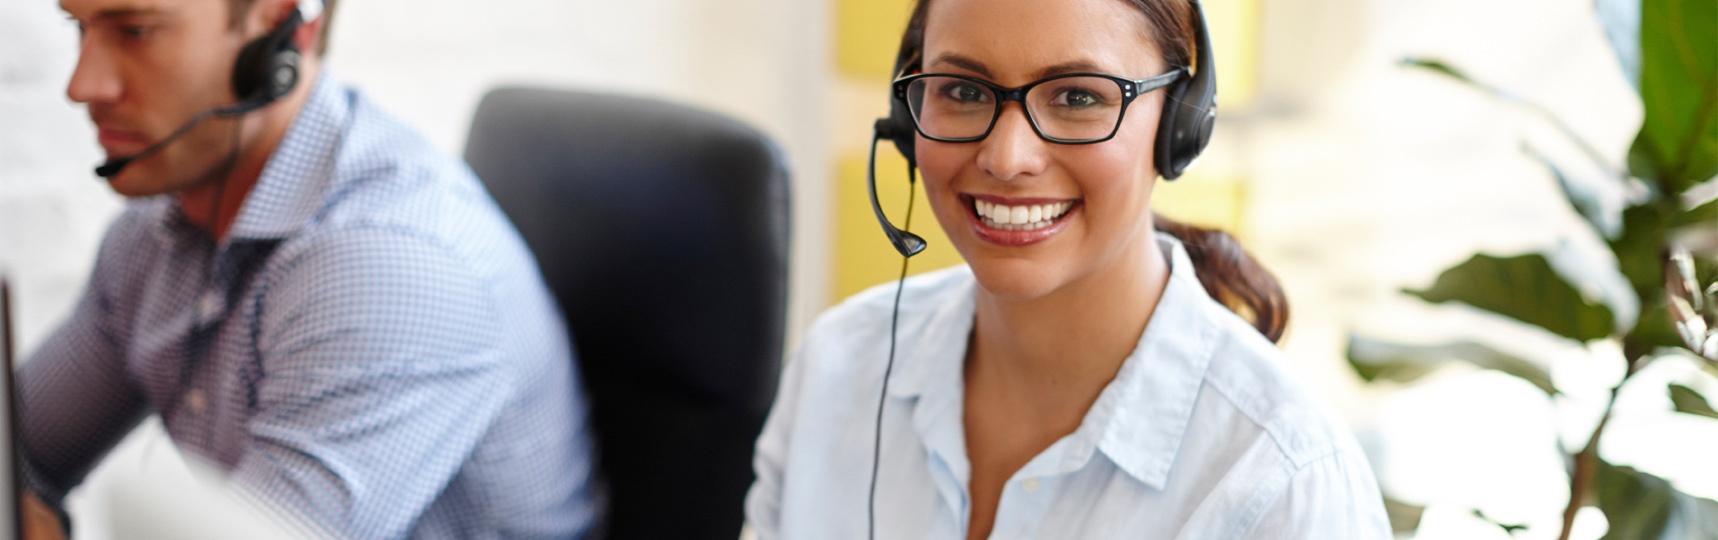 Contact a Sales Representative Today